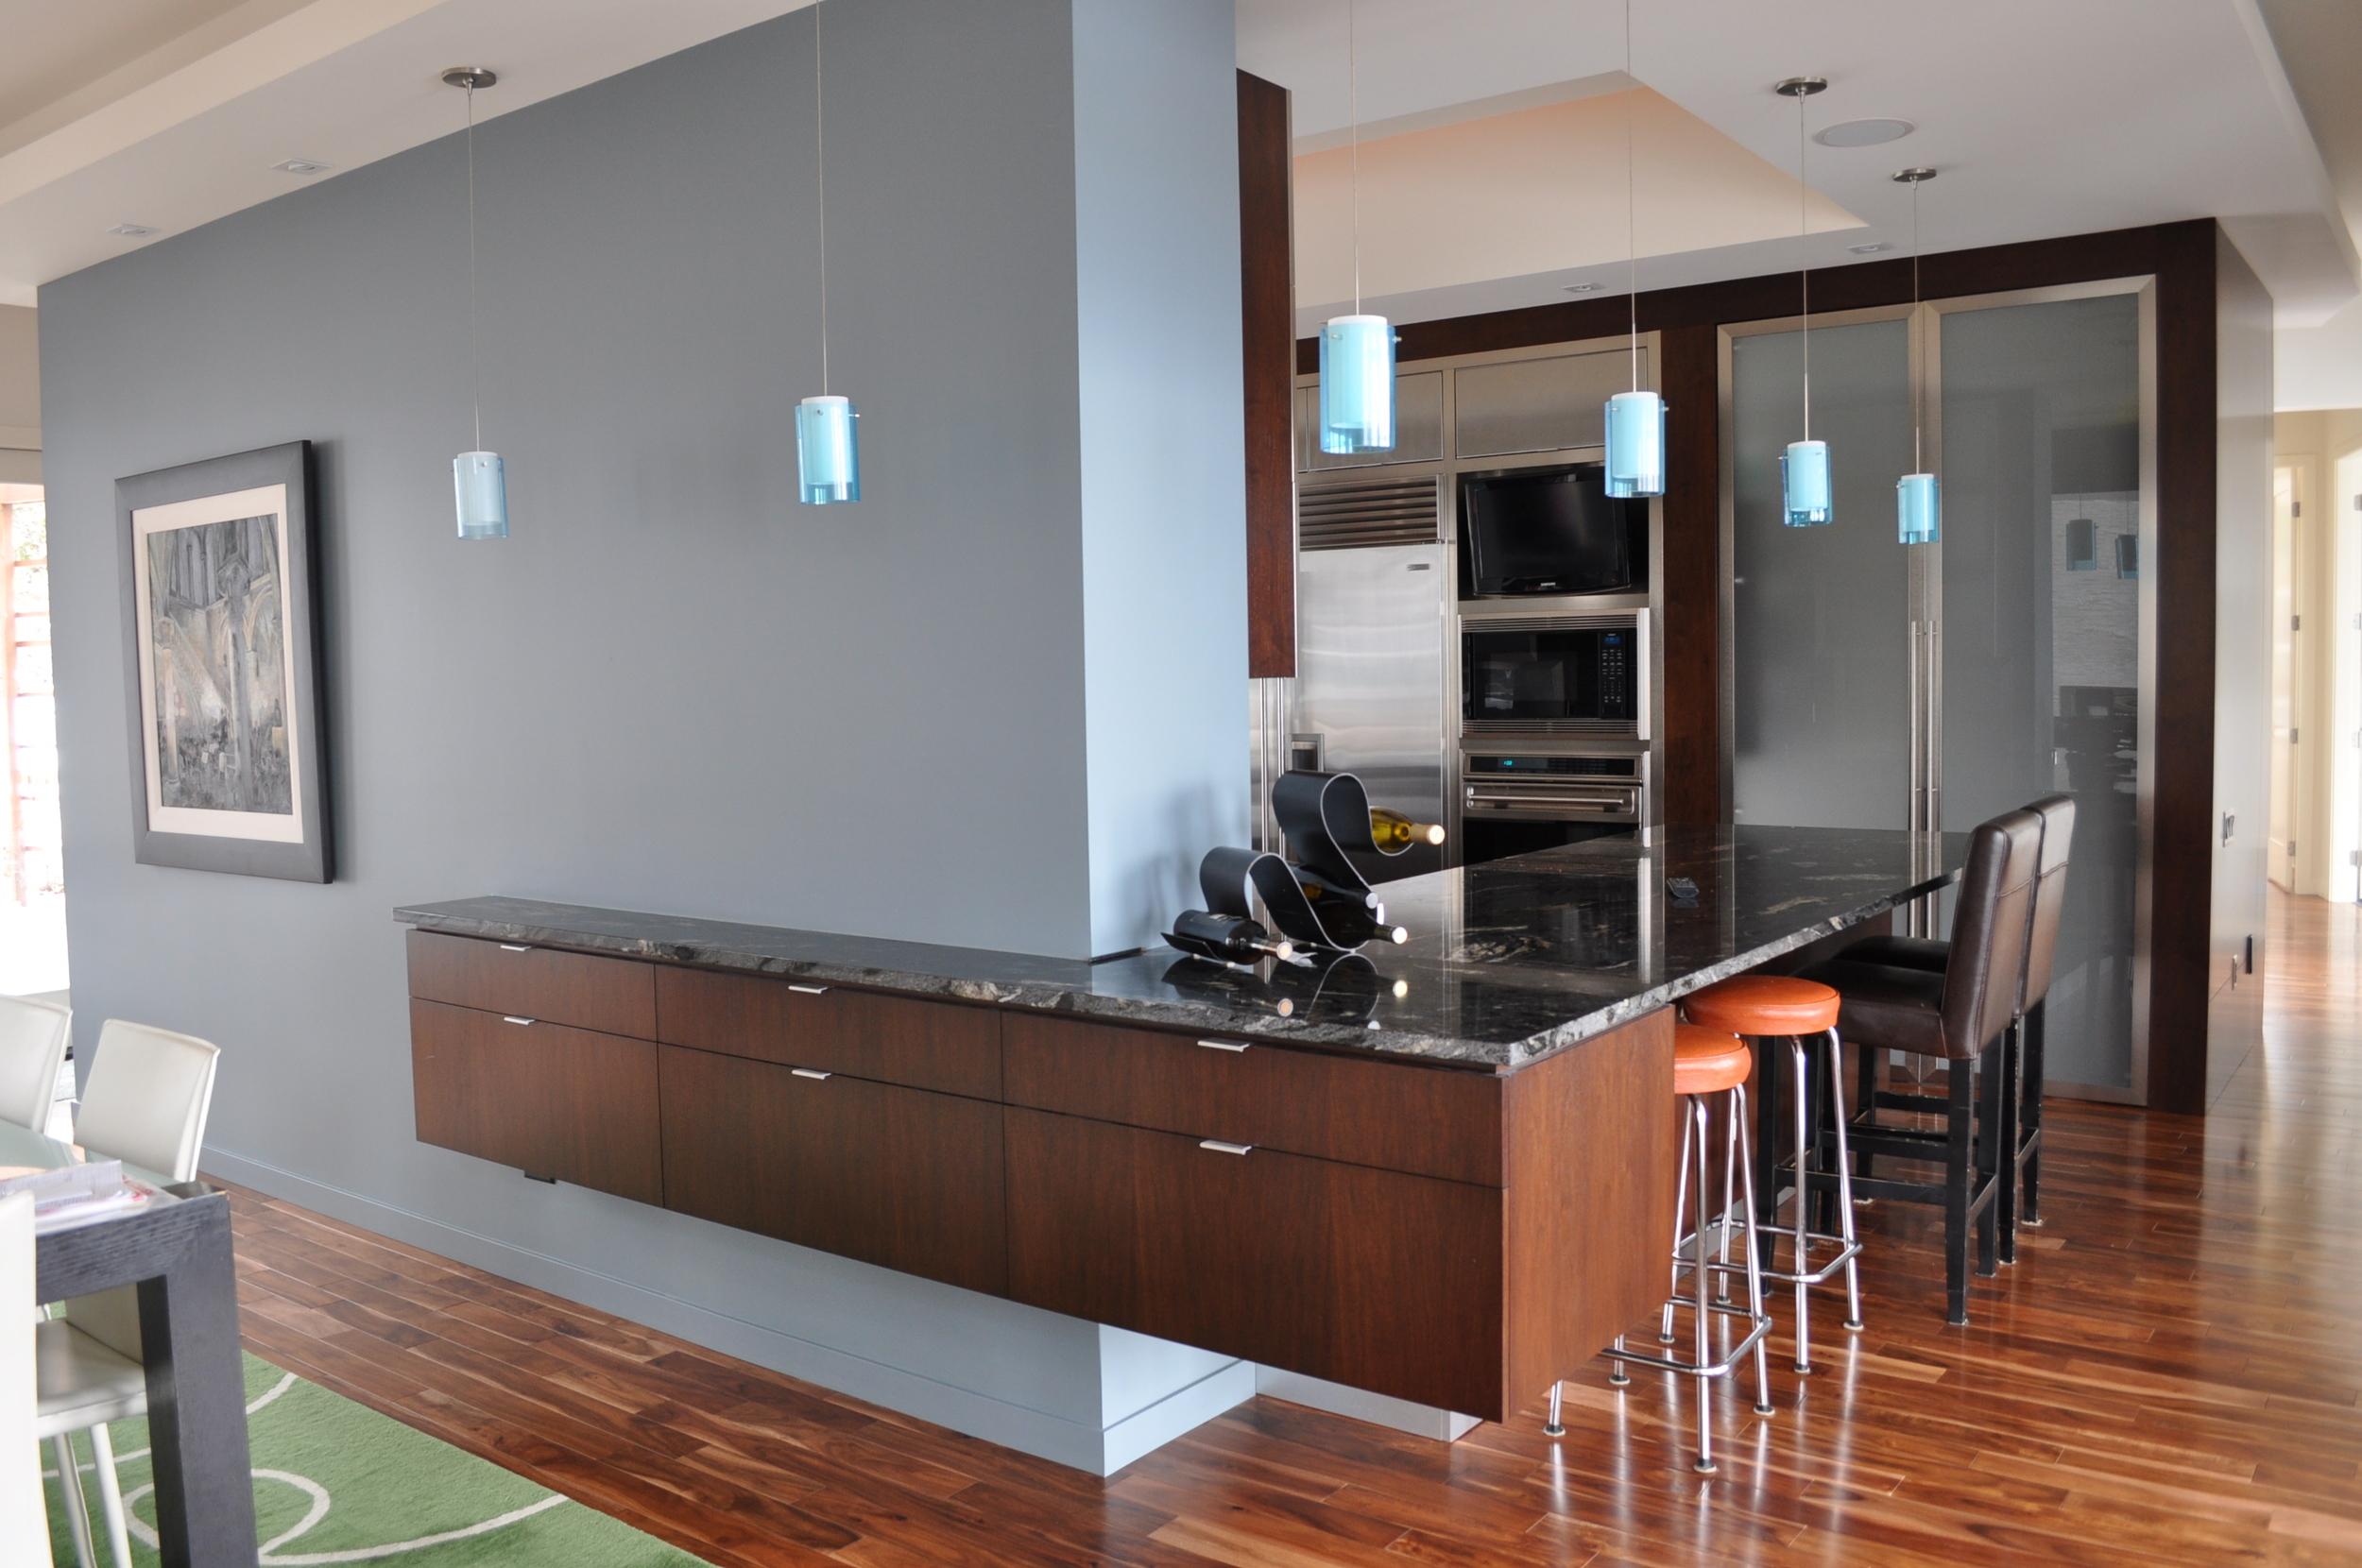 transitional-style-walnut-kitchen-cabinetry.JPG